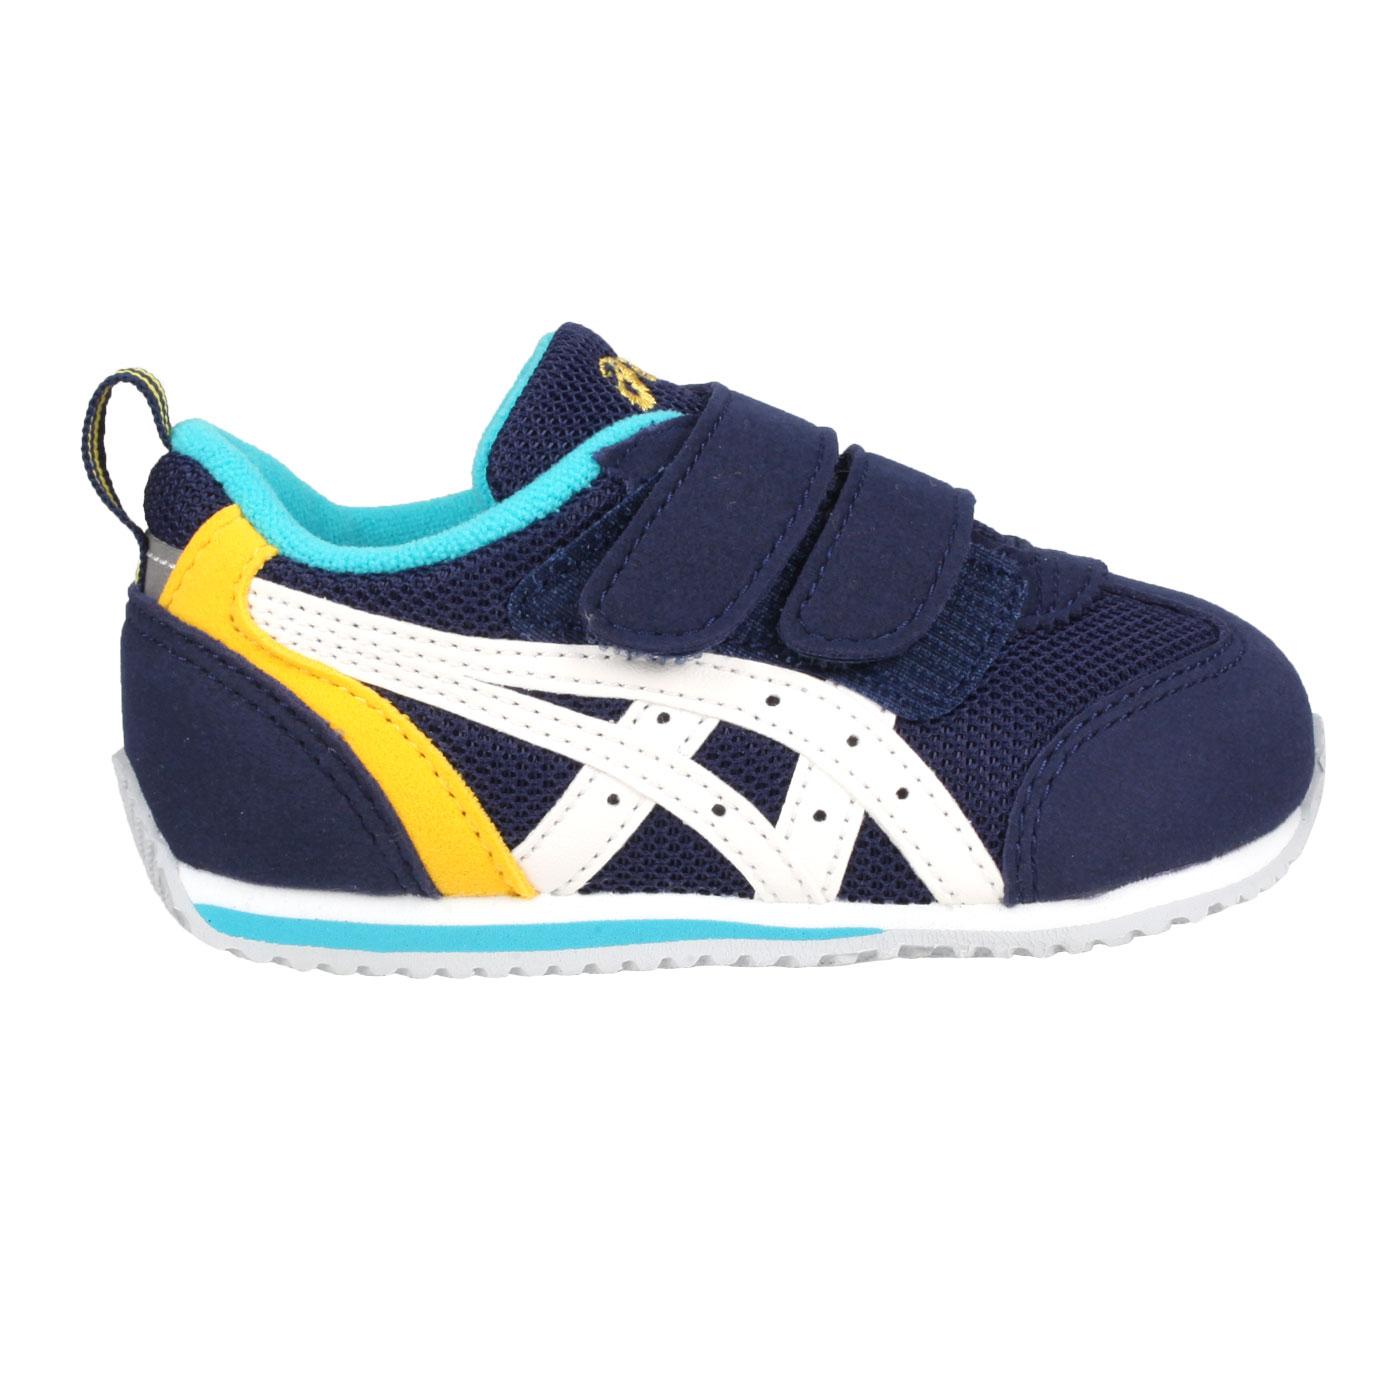 ASICS 小童運動鞋  @IDAHO BABY 3@TUB165-1901 - 丈青白黃